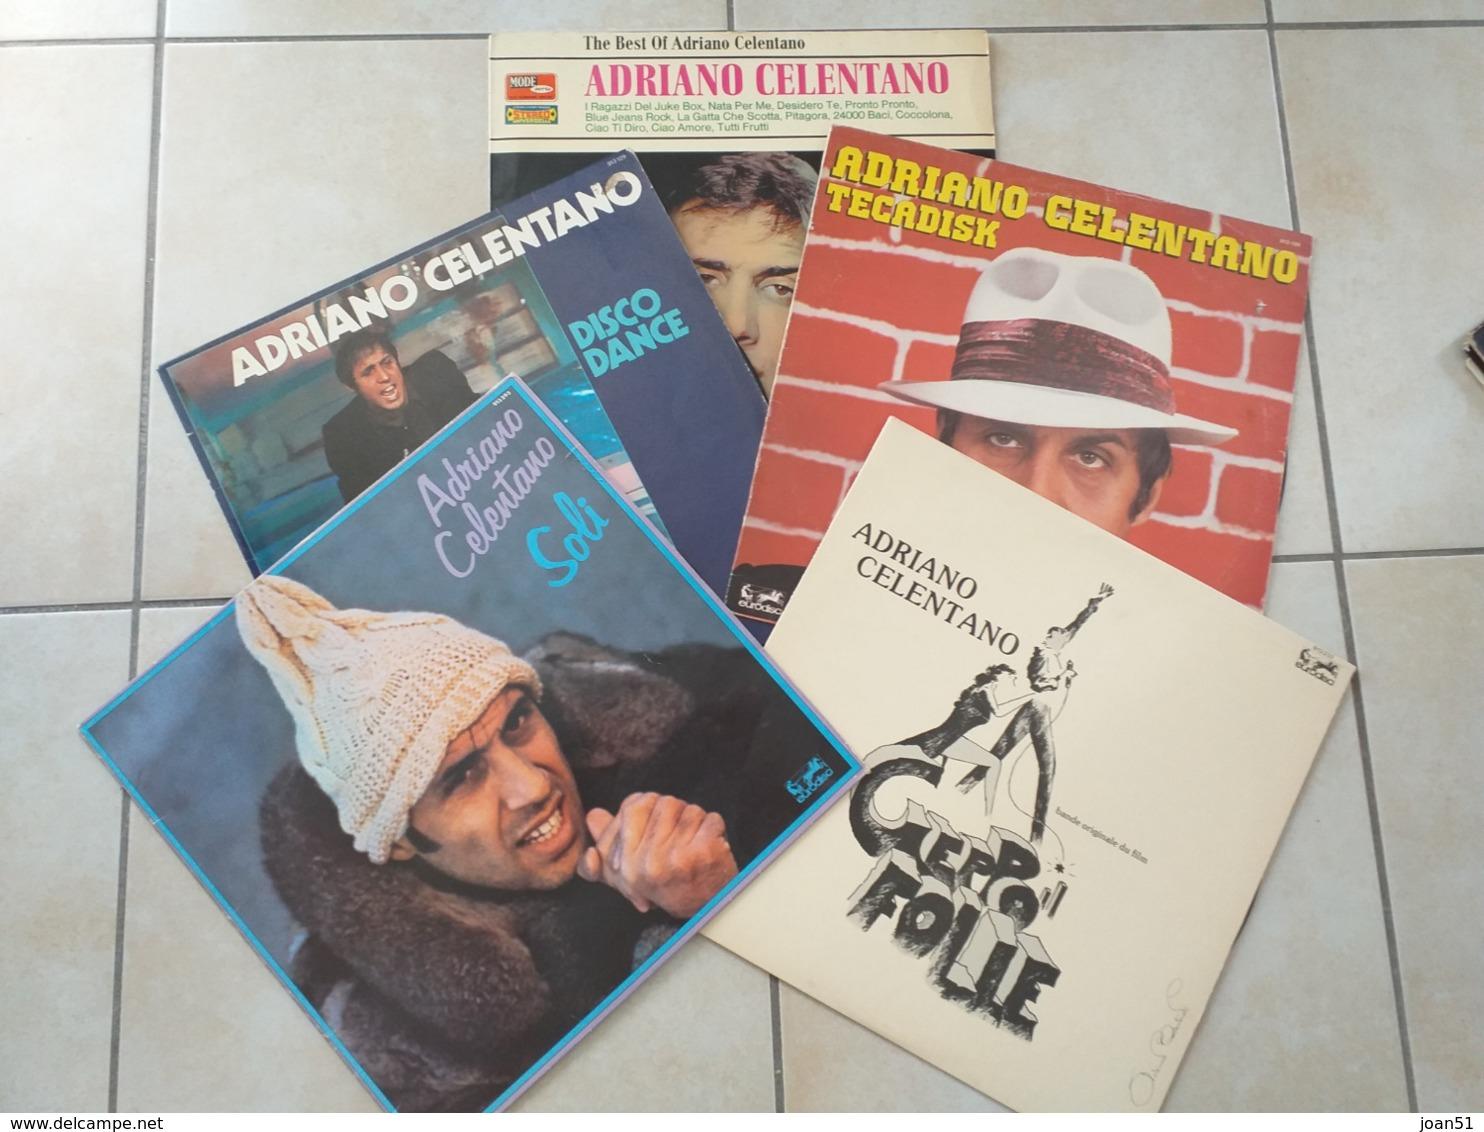 ADRIANO CELENTANO LOT DE 5 X 33 TOURS - Rock